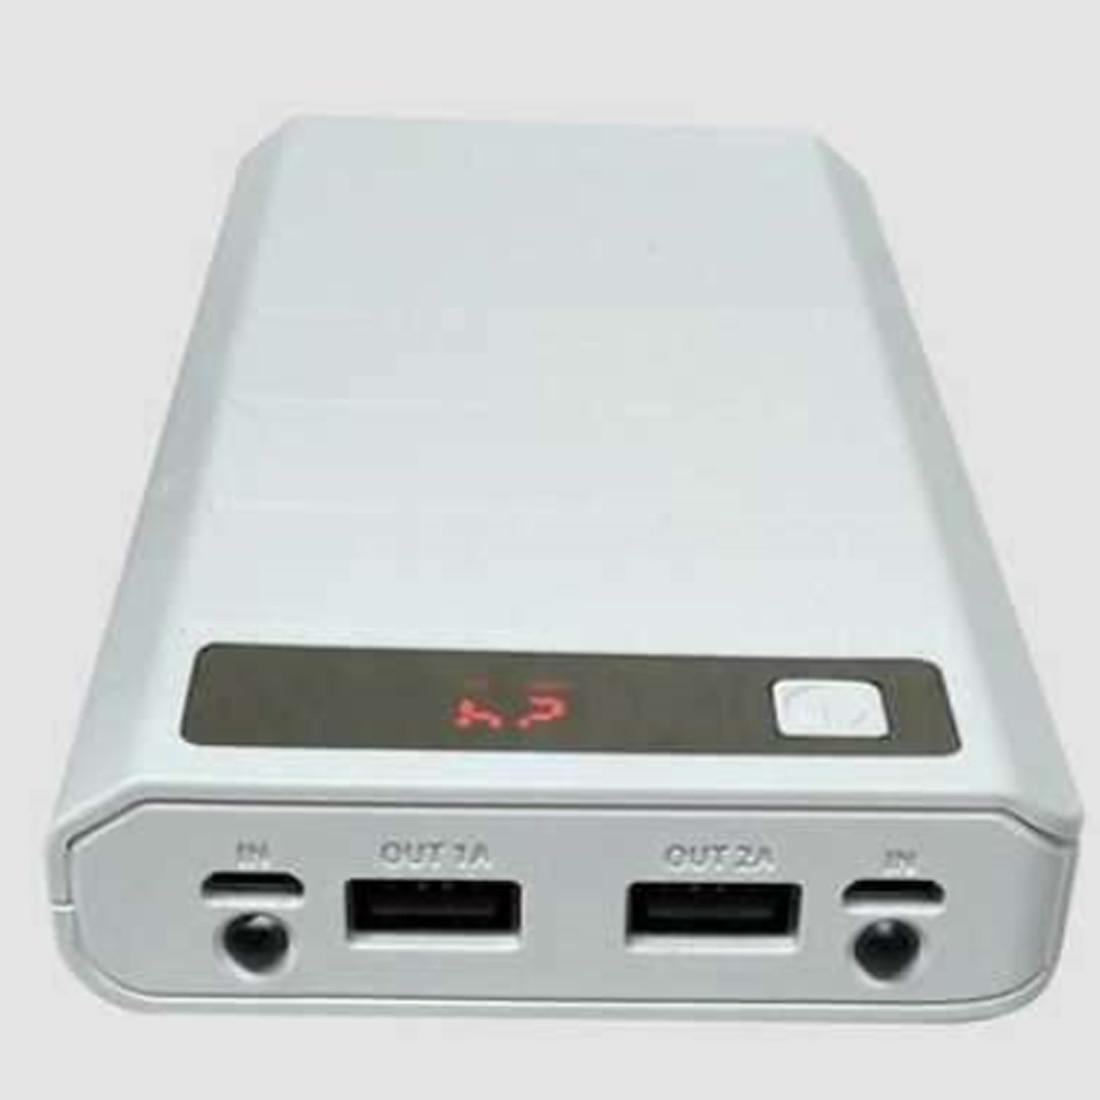 Marsnaska Venda Quente Portátil Banco De Potência USB Box Shell DIY Móvel USB Power Bank Charger Case Pack 8pcs 18650 suporte da bateria LCD